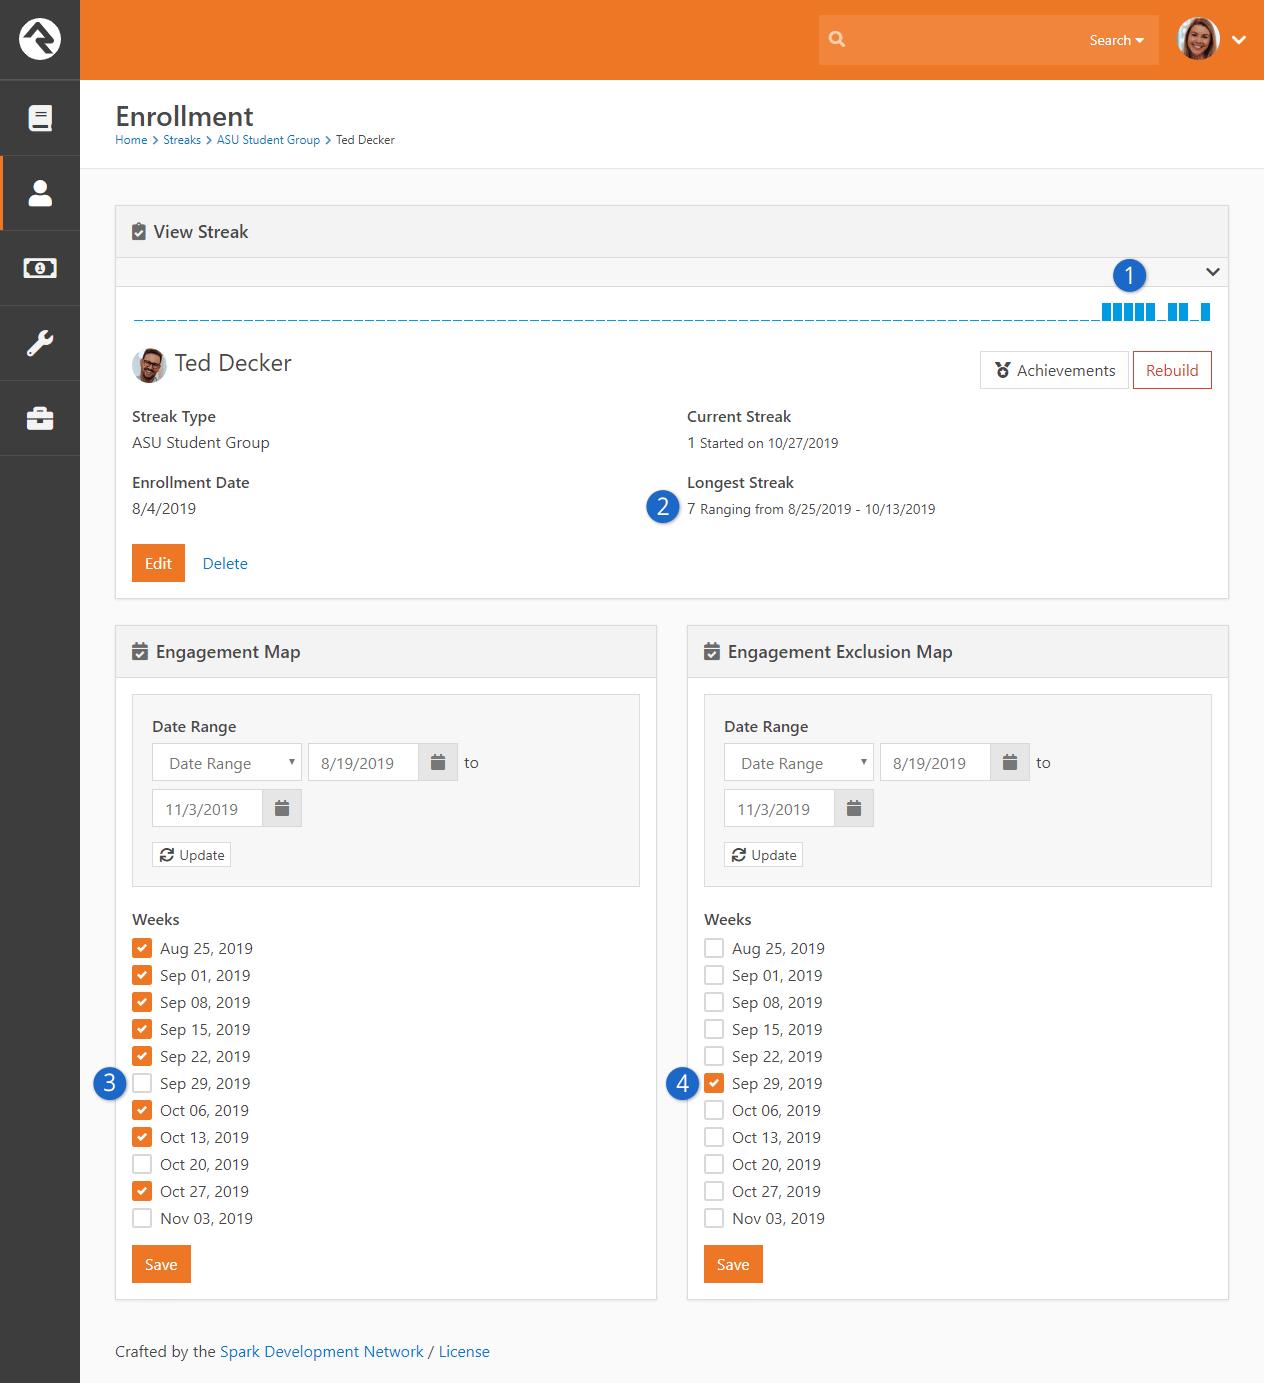 Enrollment Detail Page - Exclusion